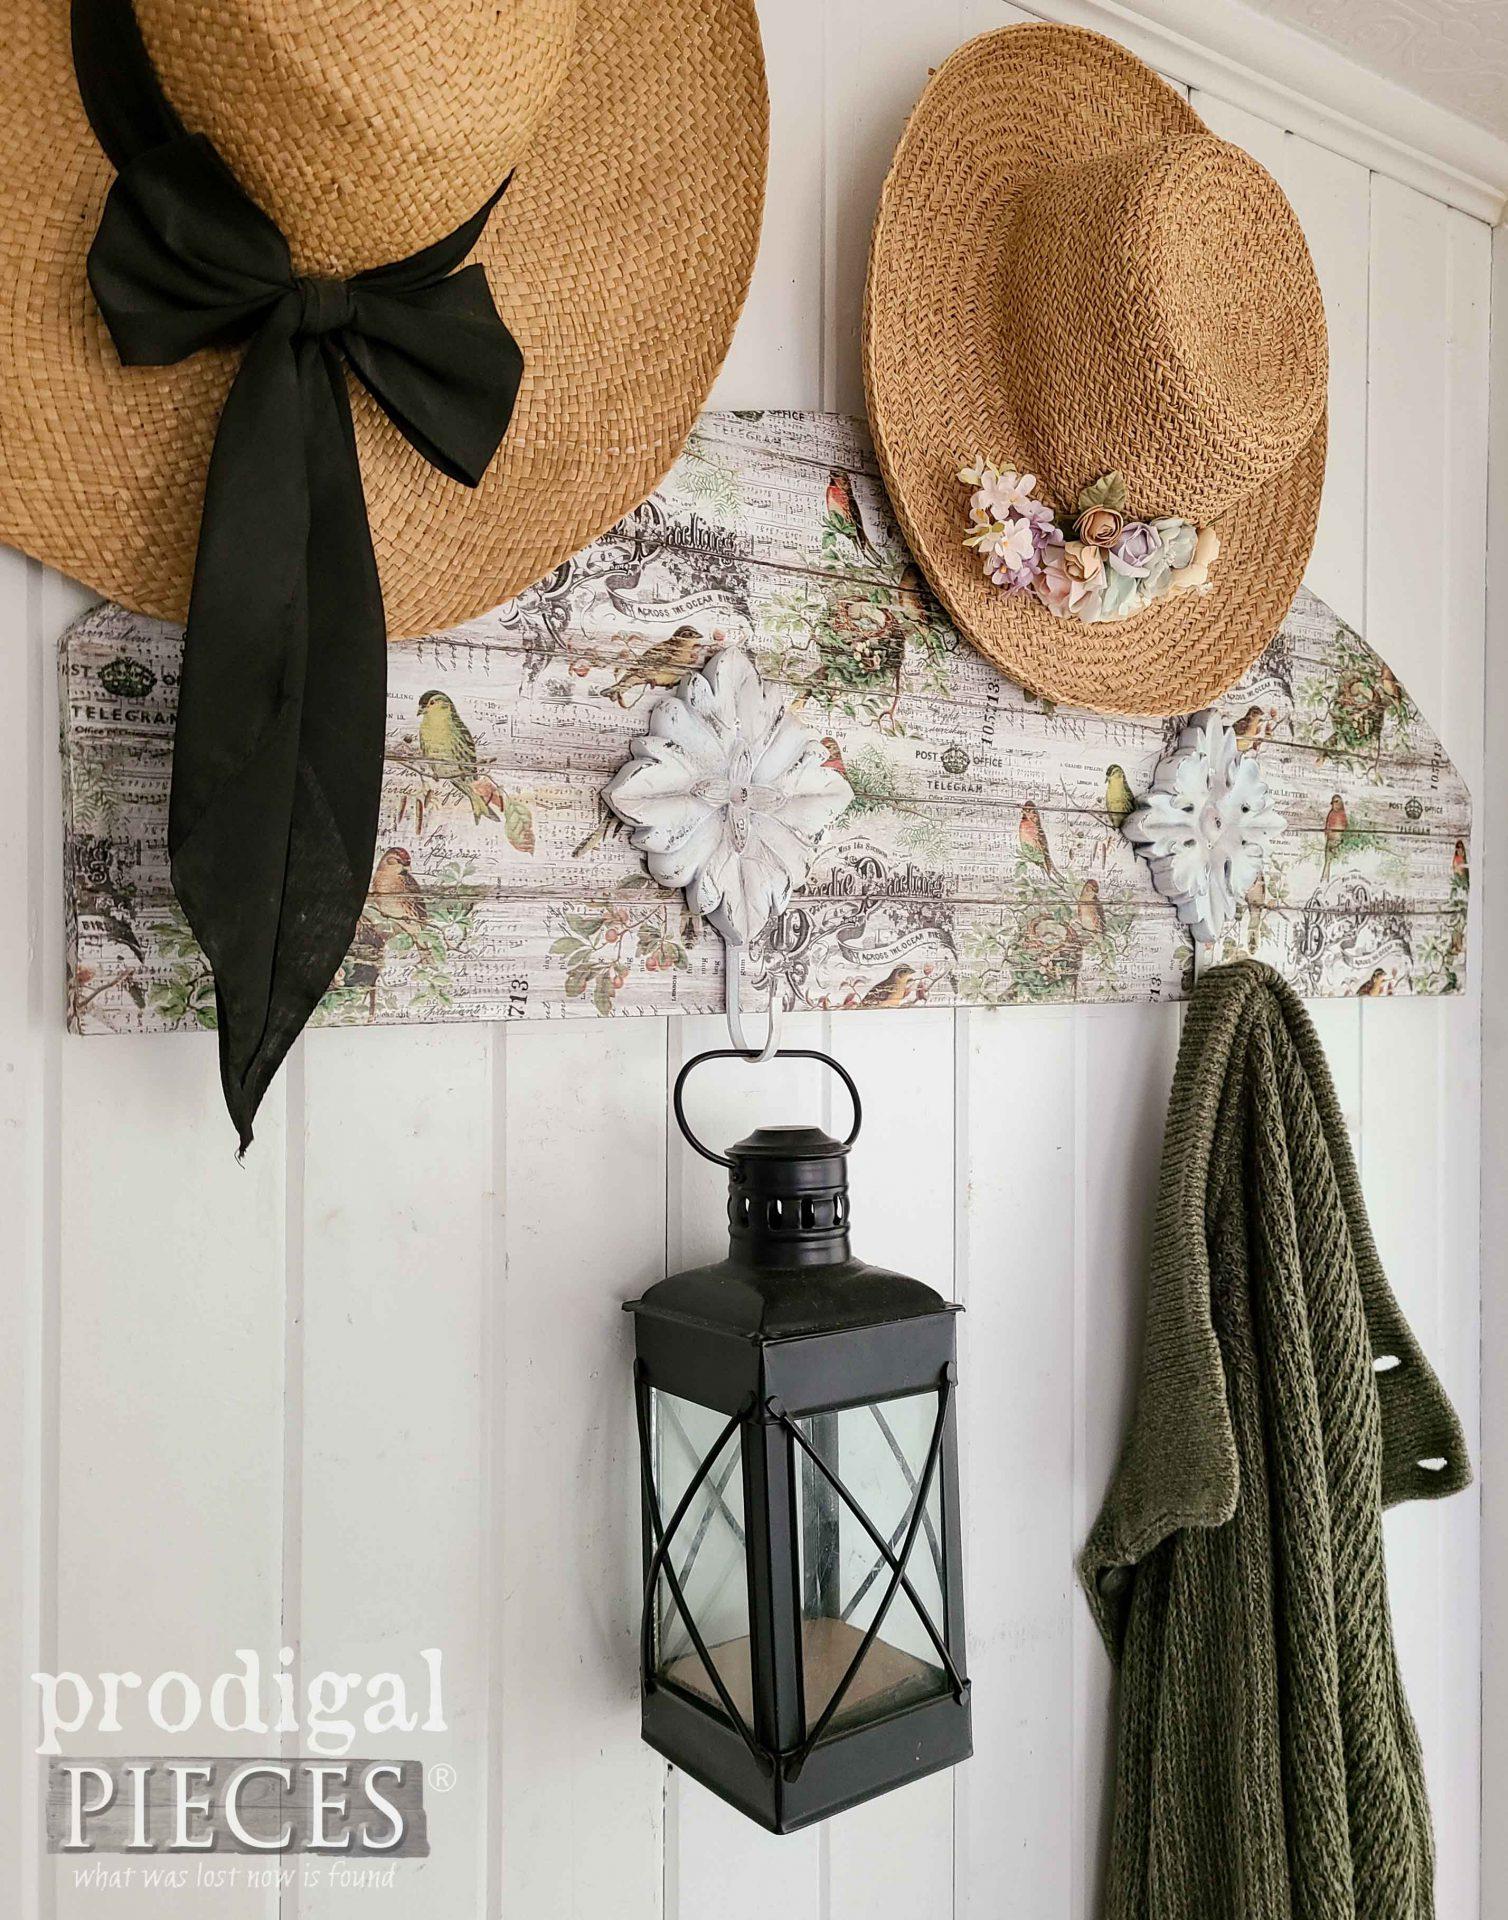 Cottage Chic DIY Decoupage Coat Rack by Larissa of Prodigal Pieces | prodigalpieces.com #prodigalpieces #cottage #home #homedecor